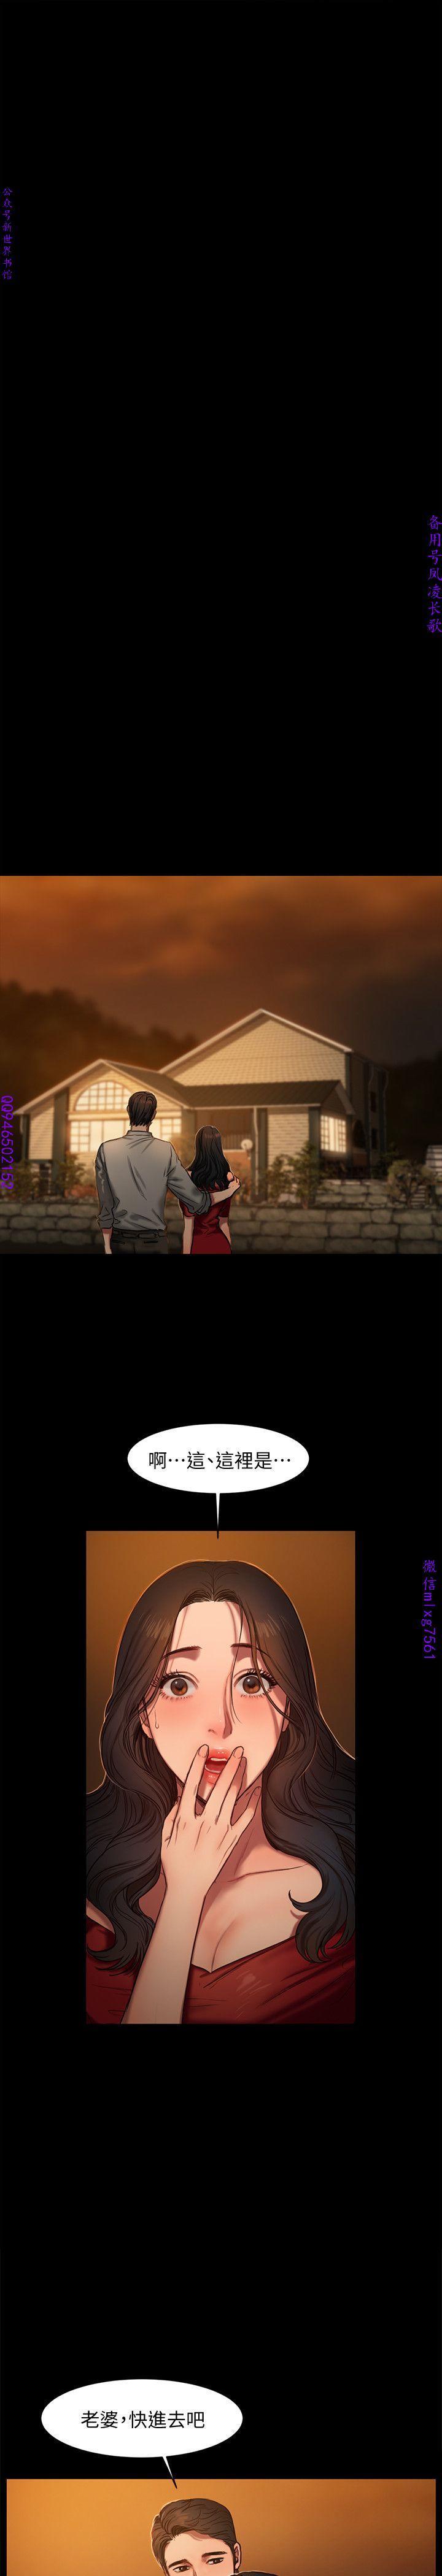 Run away 1-10【中文】 61